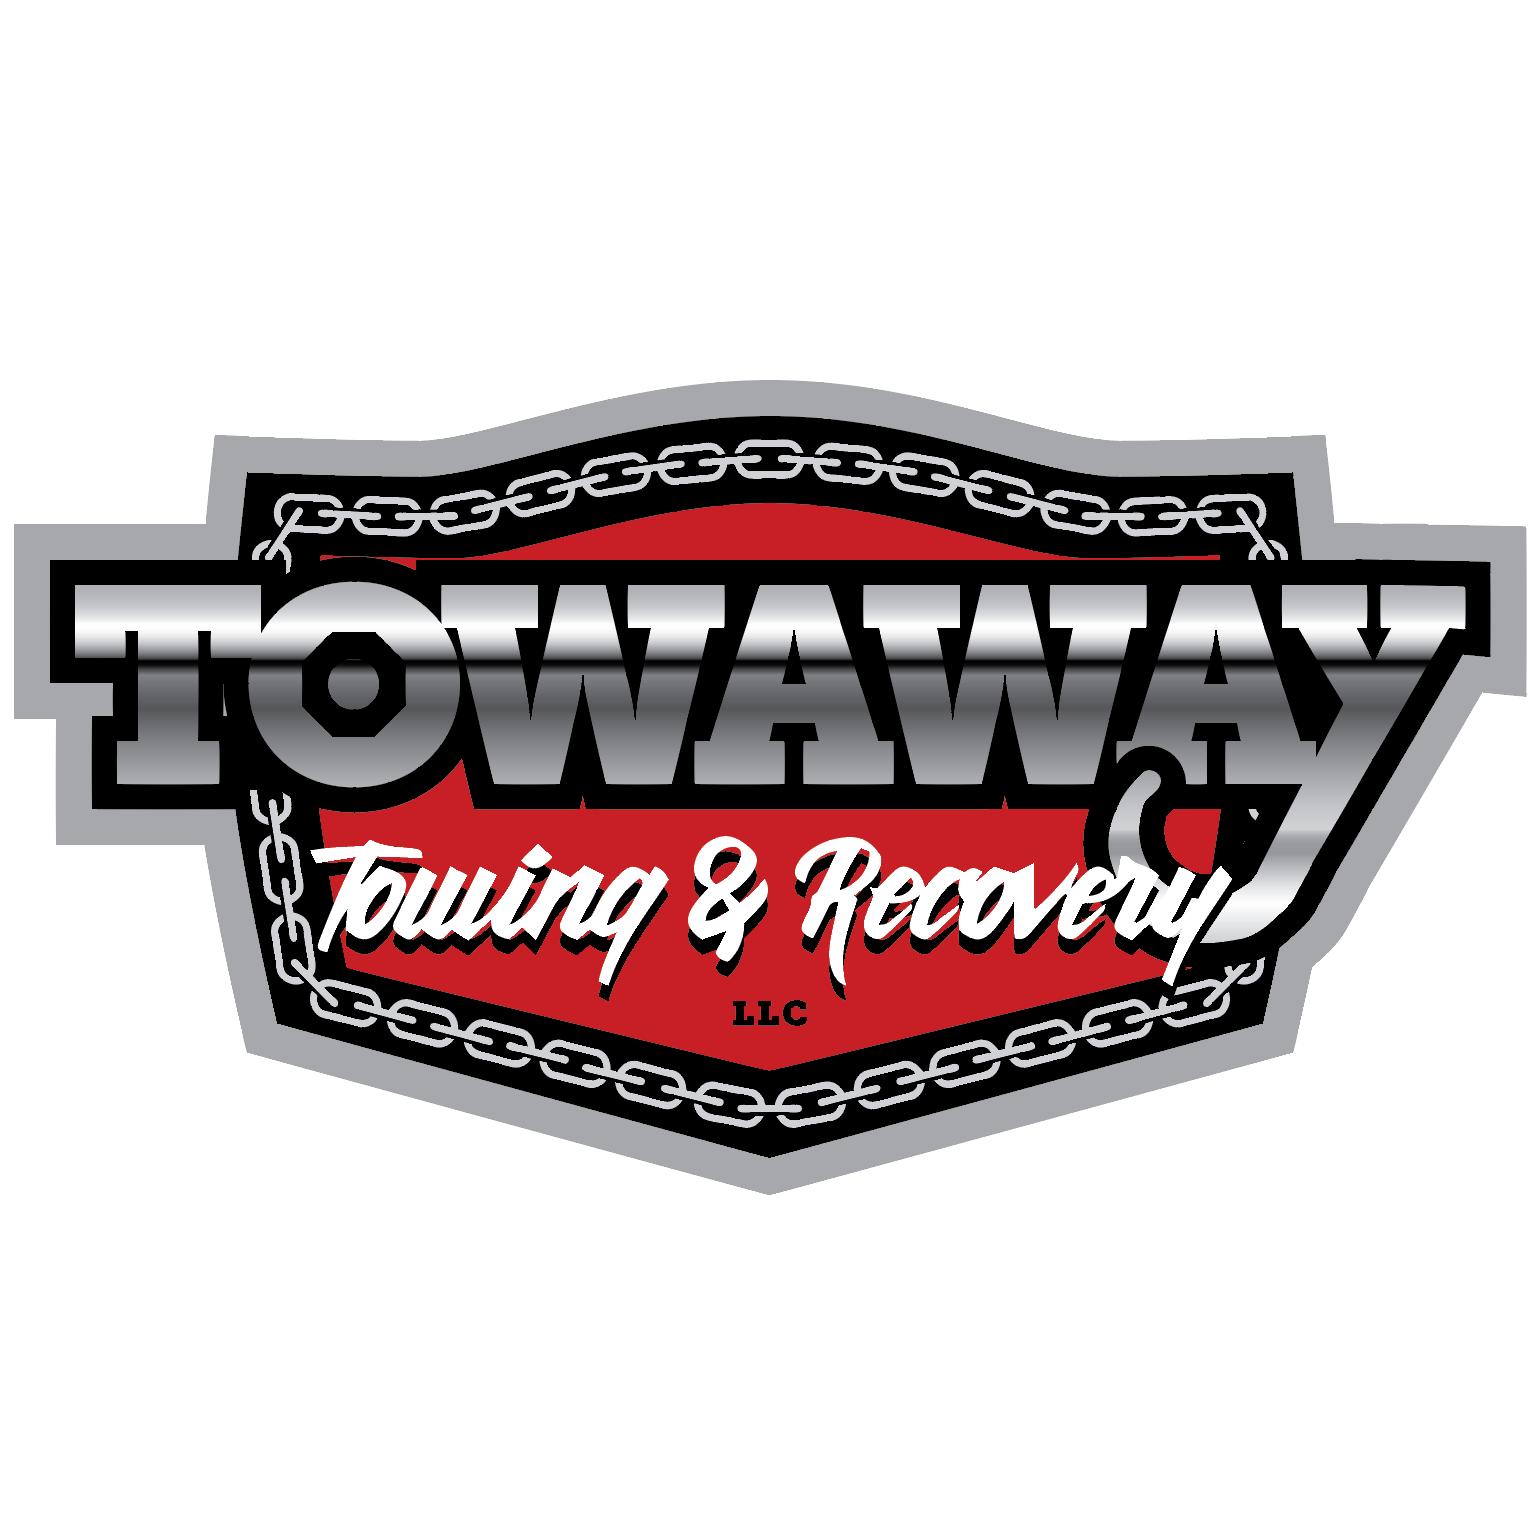 TowAway LLC